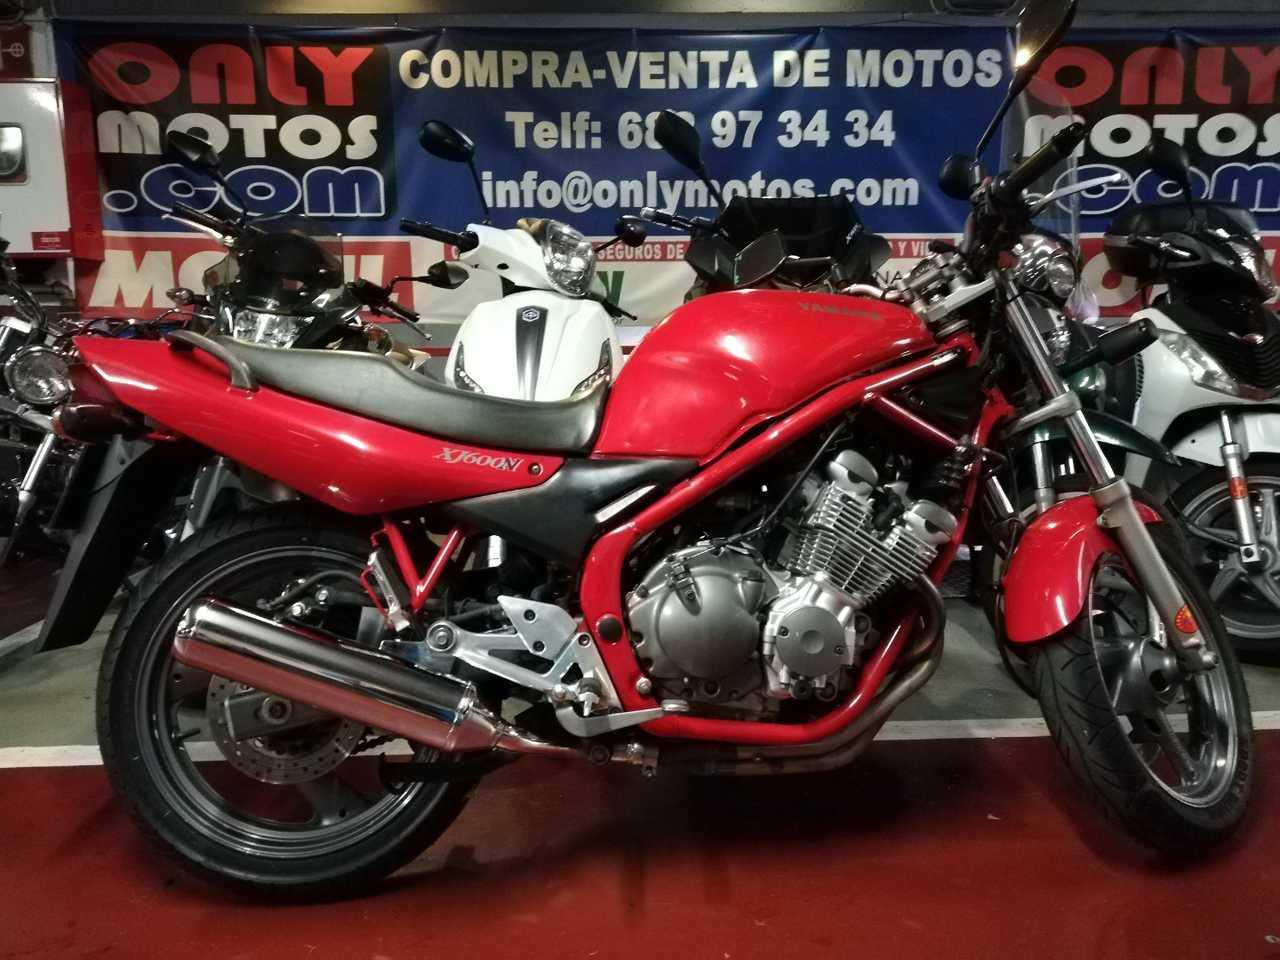 Yamaha XJ 600 N DIVERSION  - Foto 1